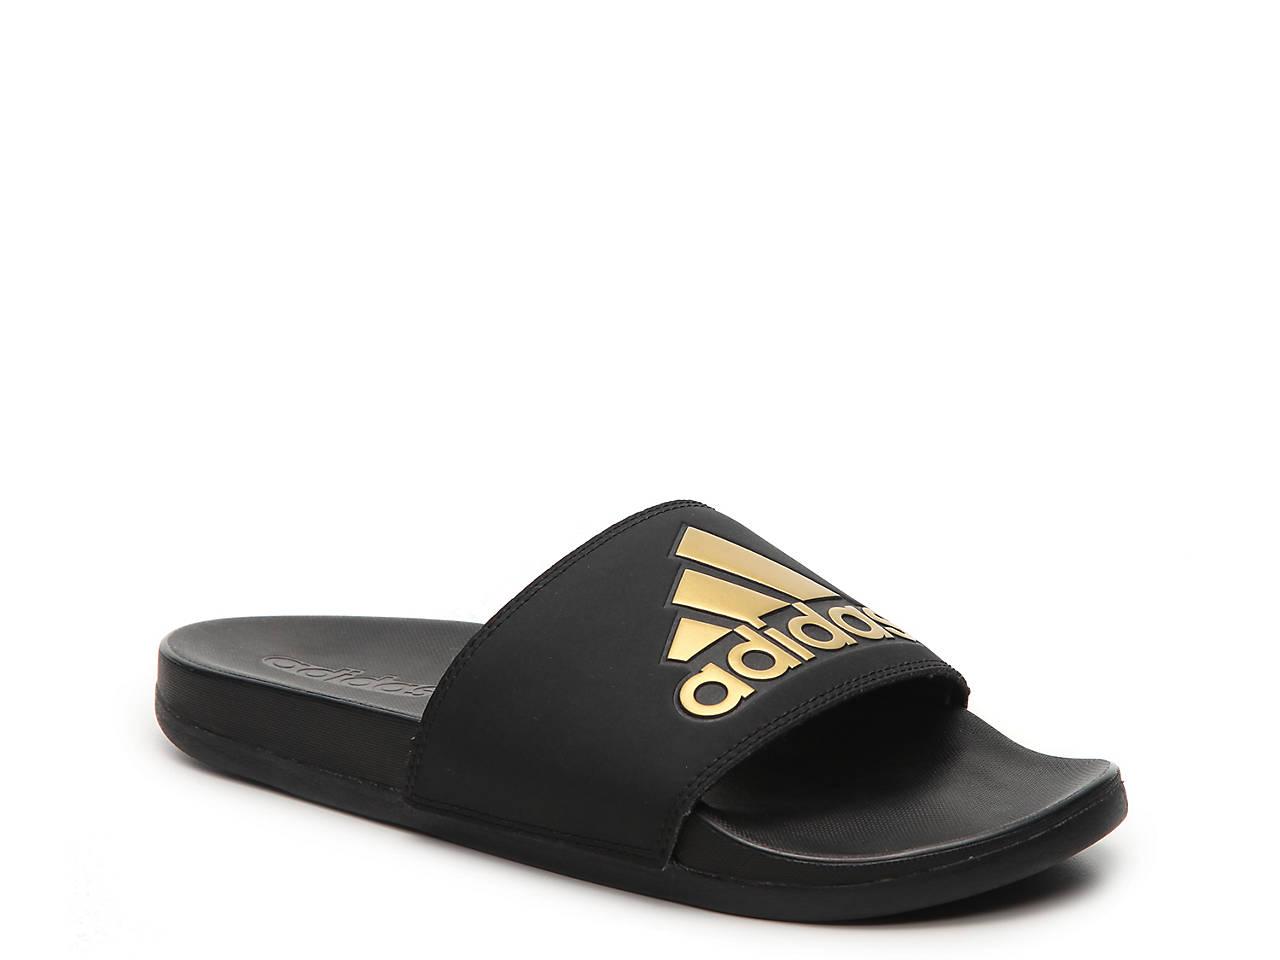 Adidas adilette CF Slide Sandal  mujer 's mujer  zapatos DSW